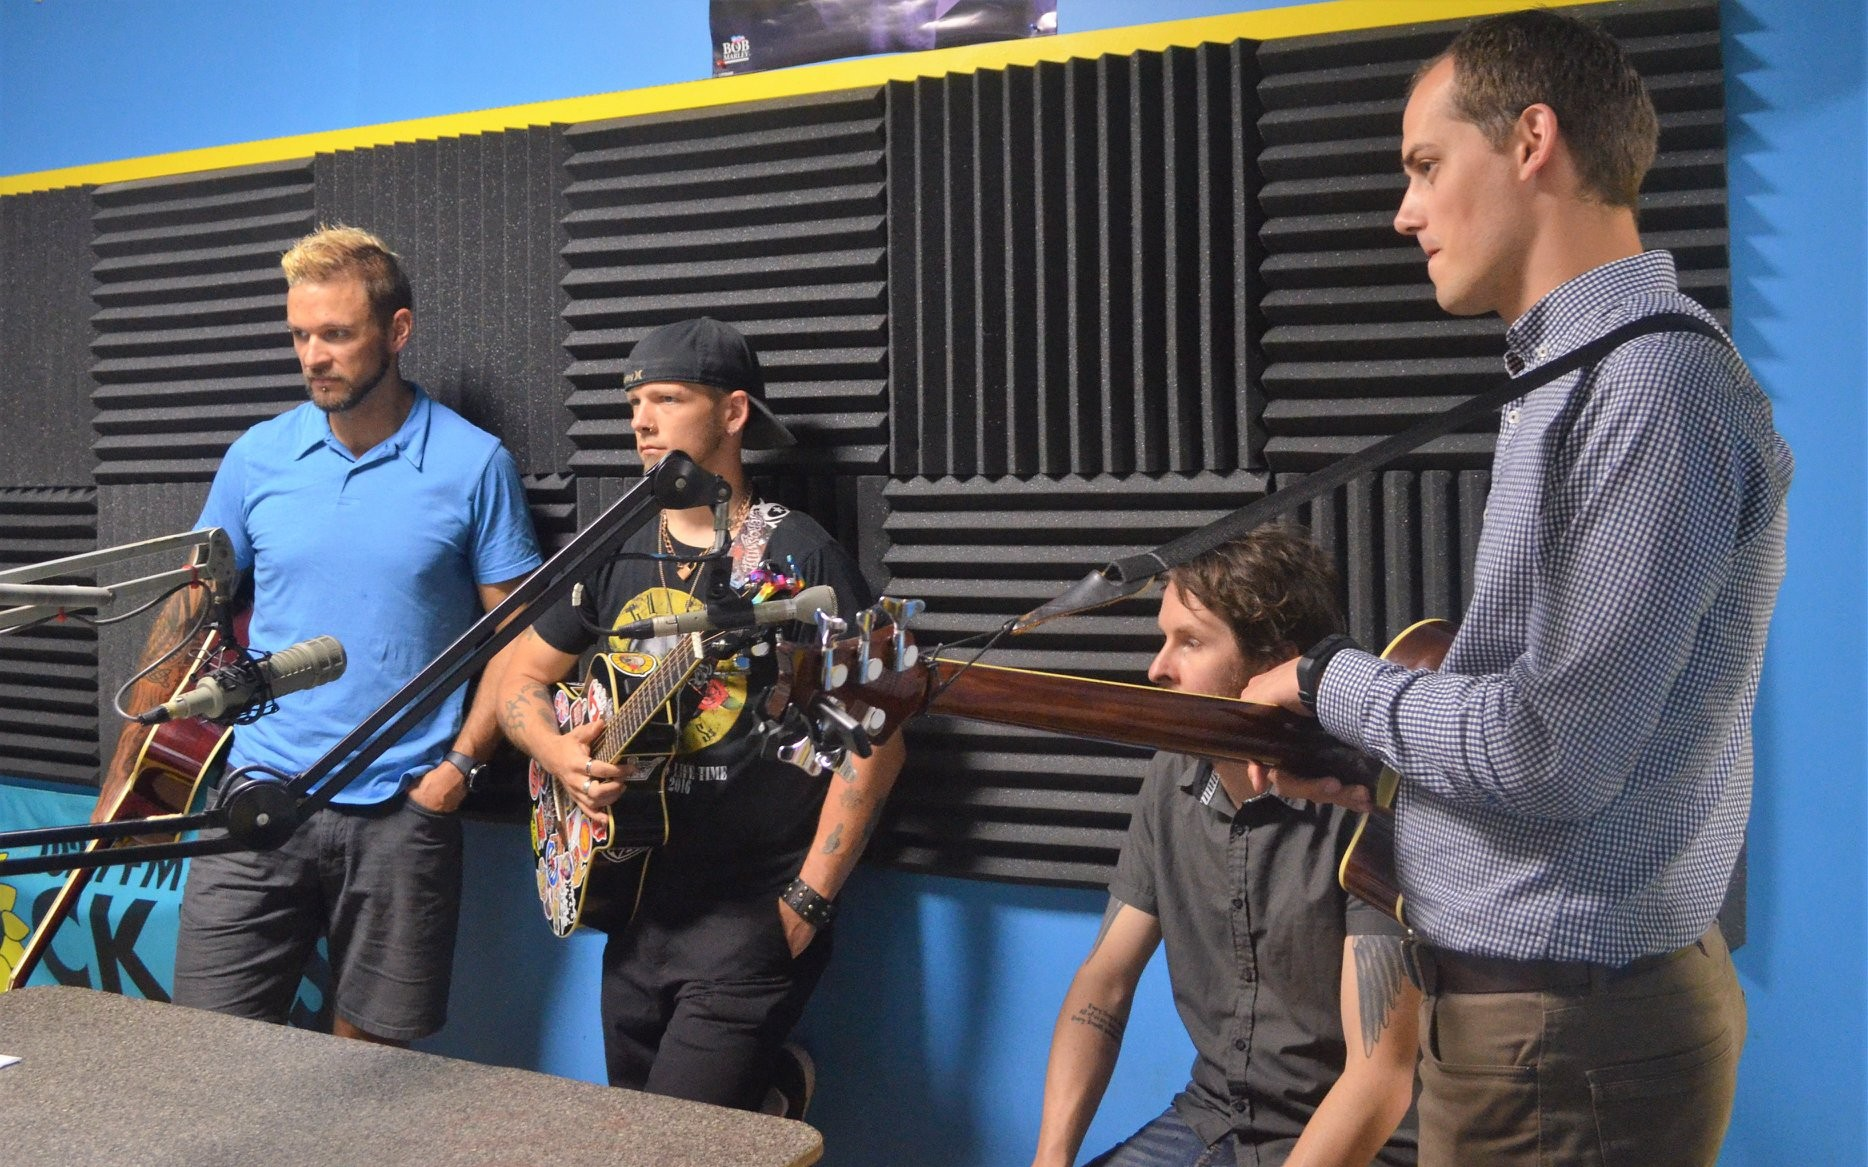 Marc Reilly, James Blacktop, Luke Ducharme, and Adom Postma